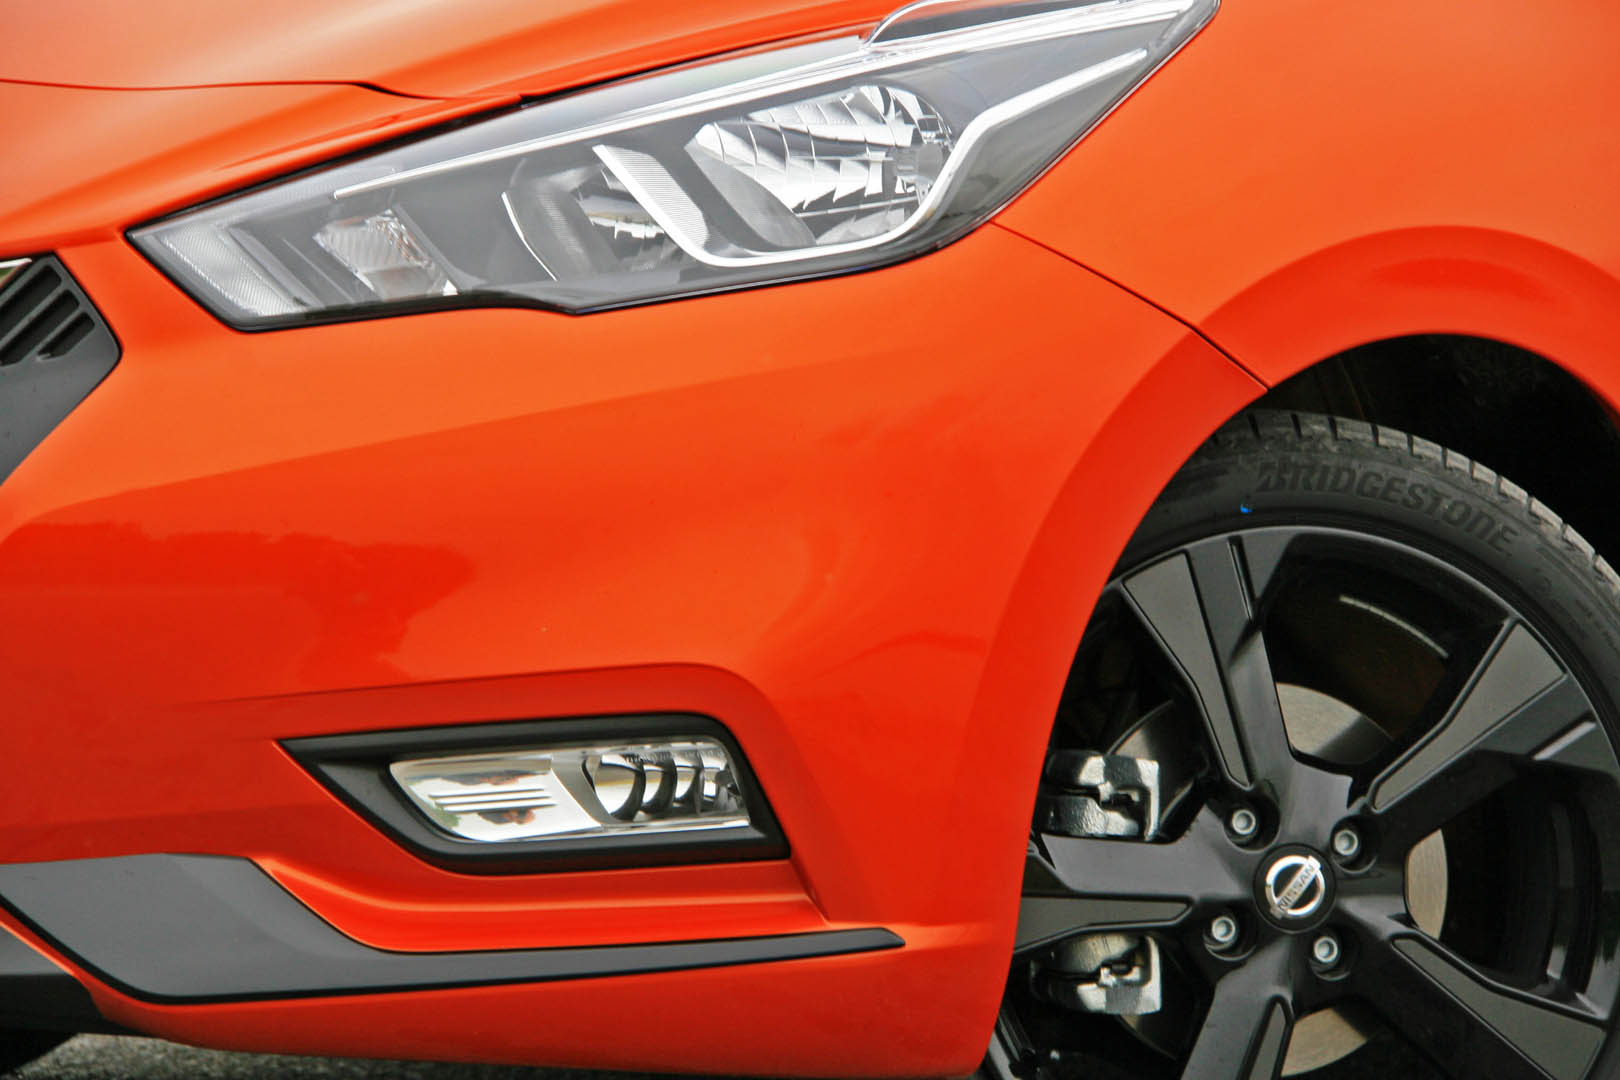 Autósvilág - Nissan Micra 2017 - Thunderstruck